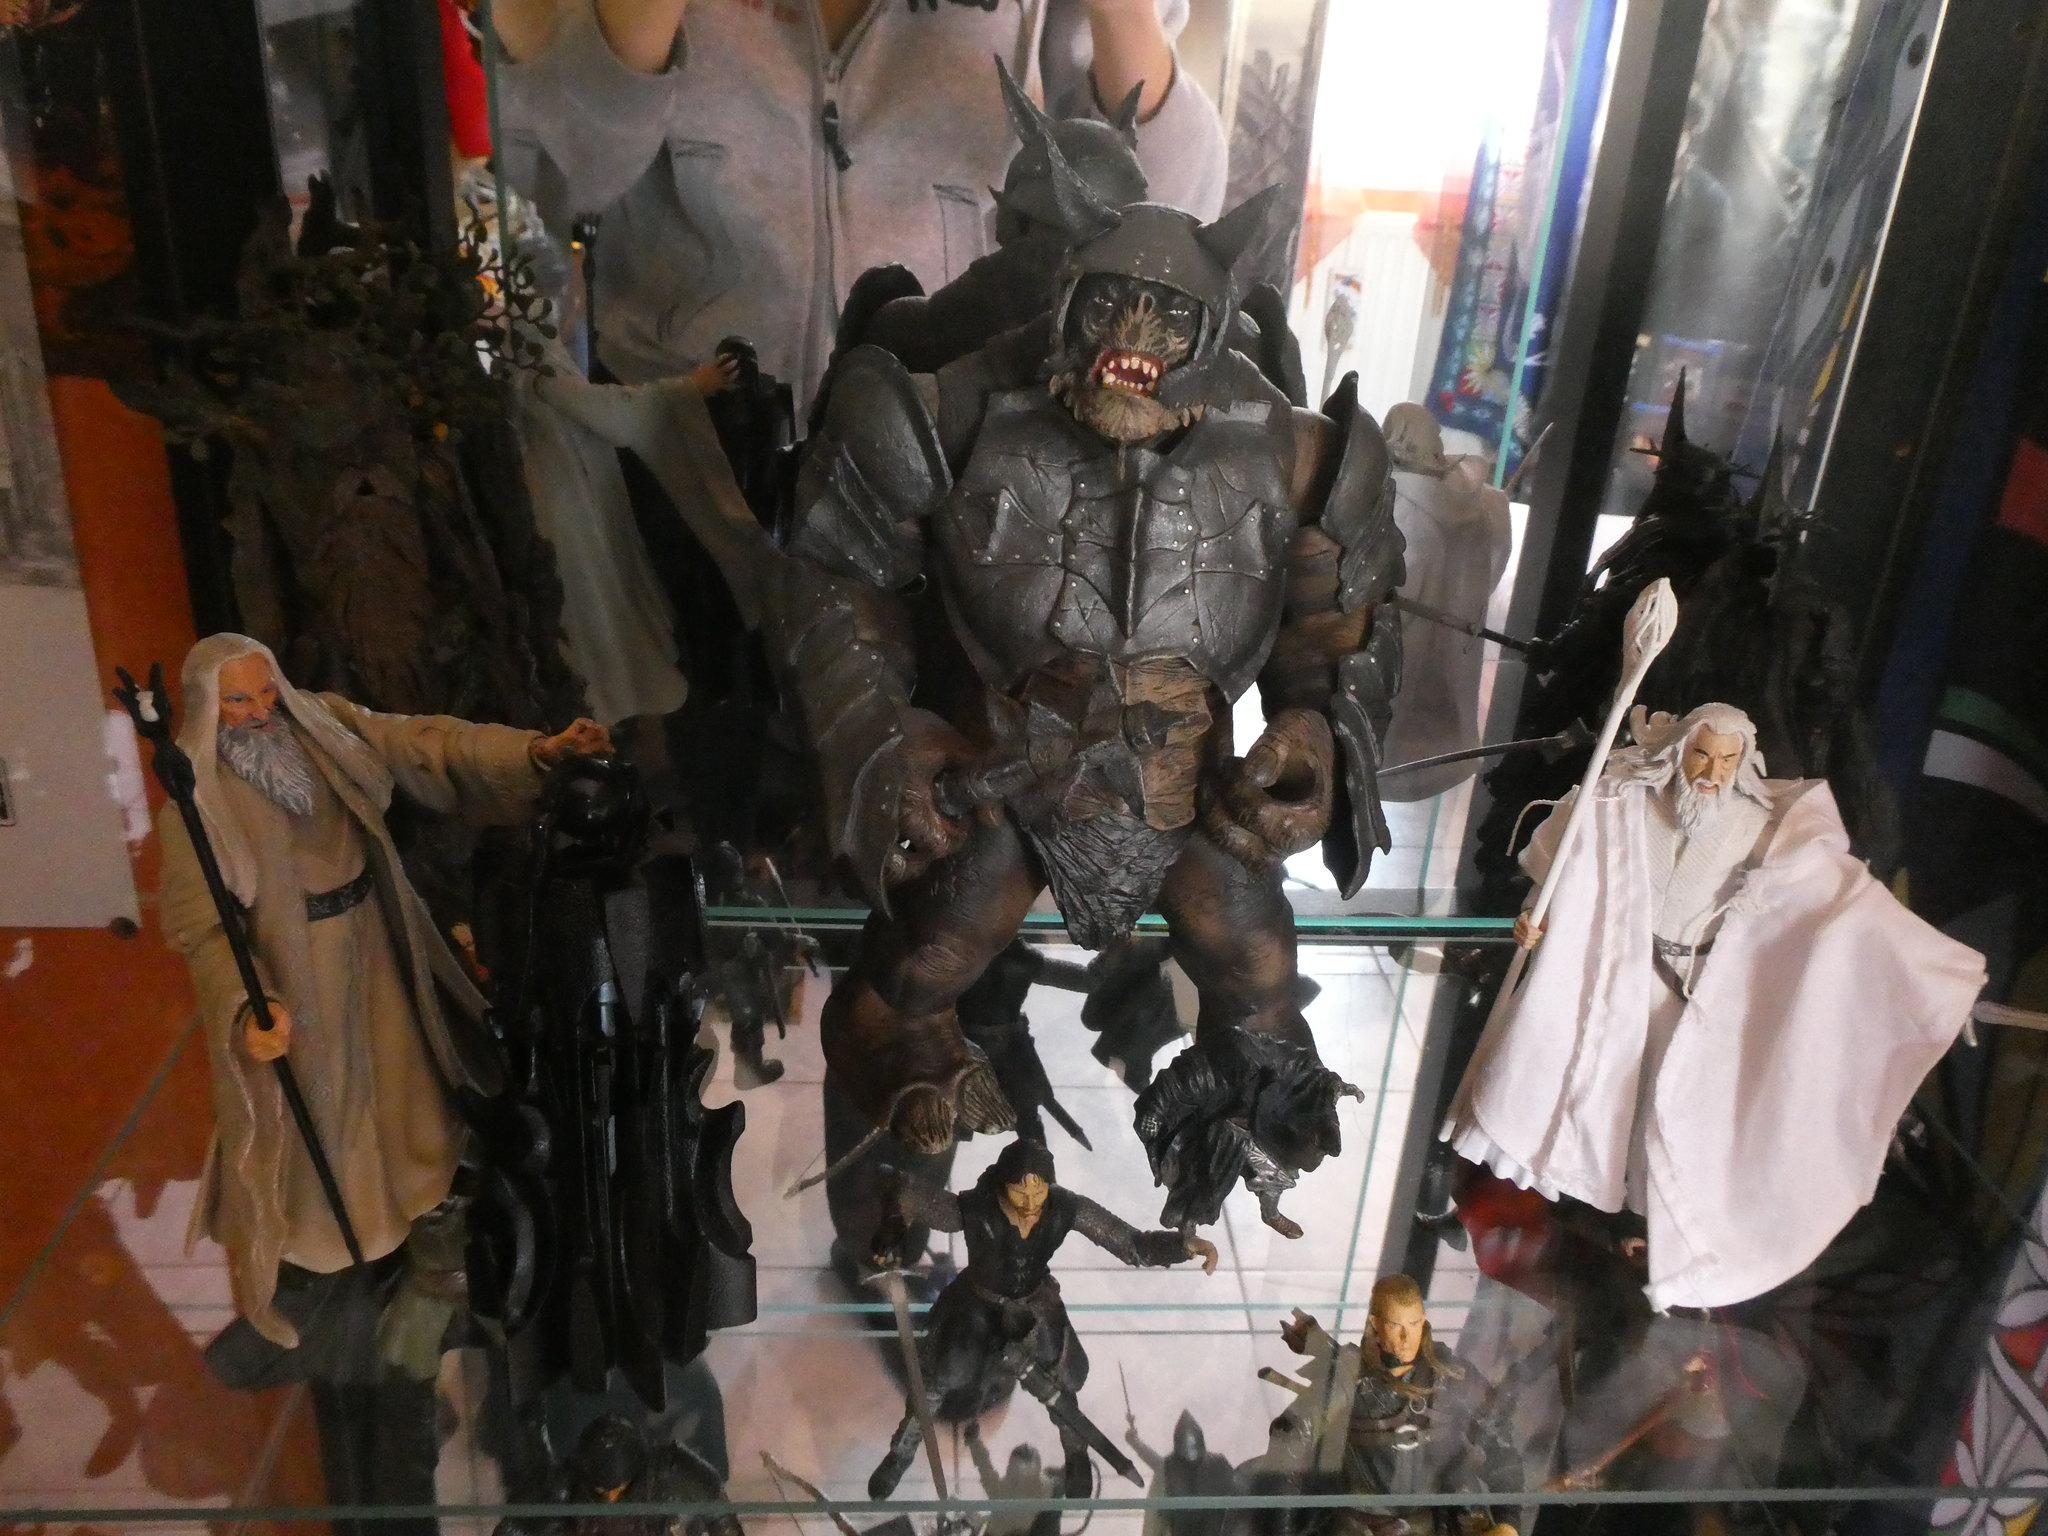 Collection Yvdir (LOTR / Marvel) 49765648951_156f35a642_k